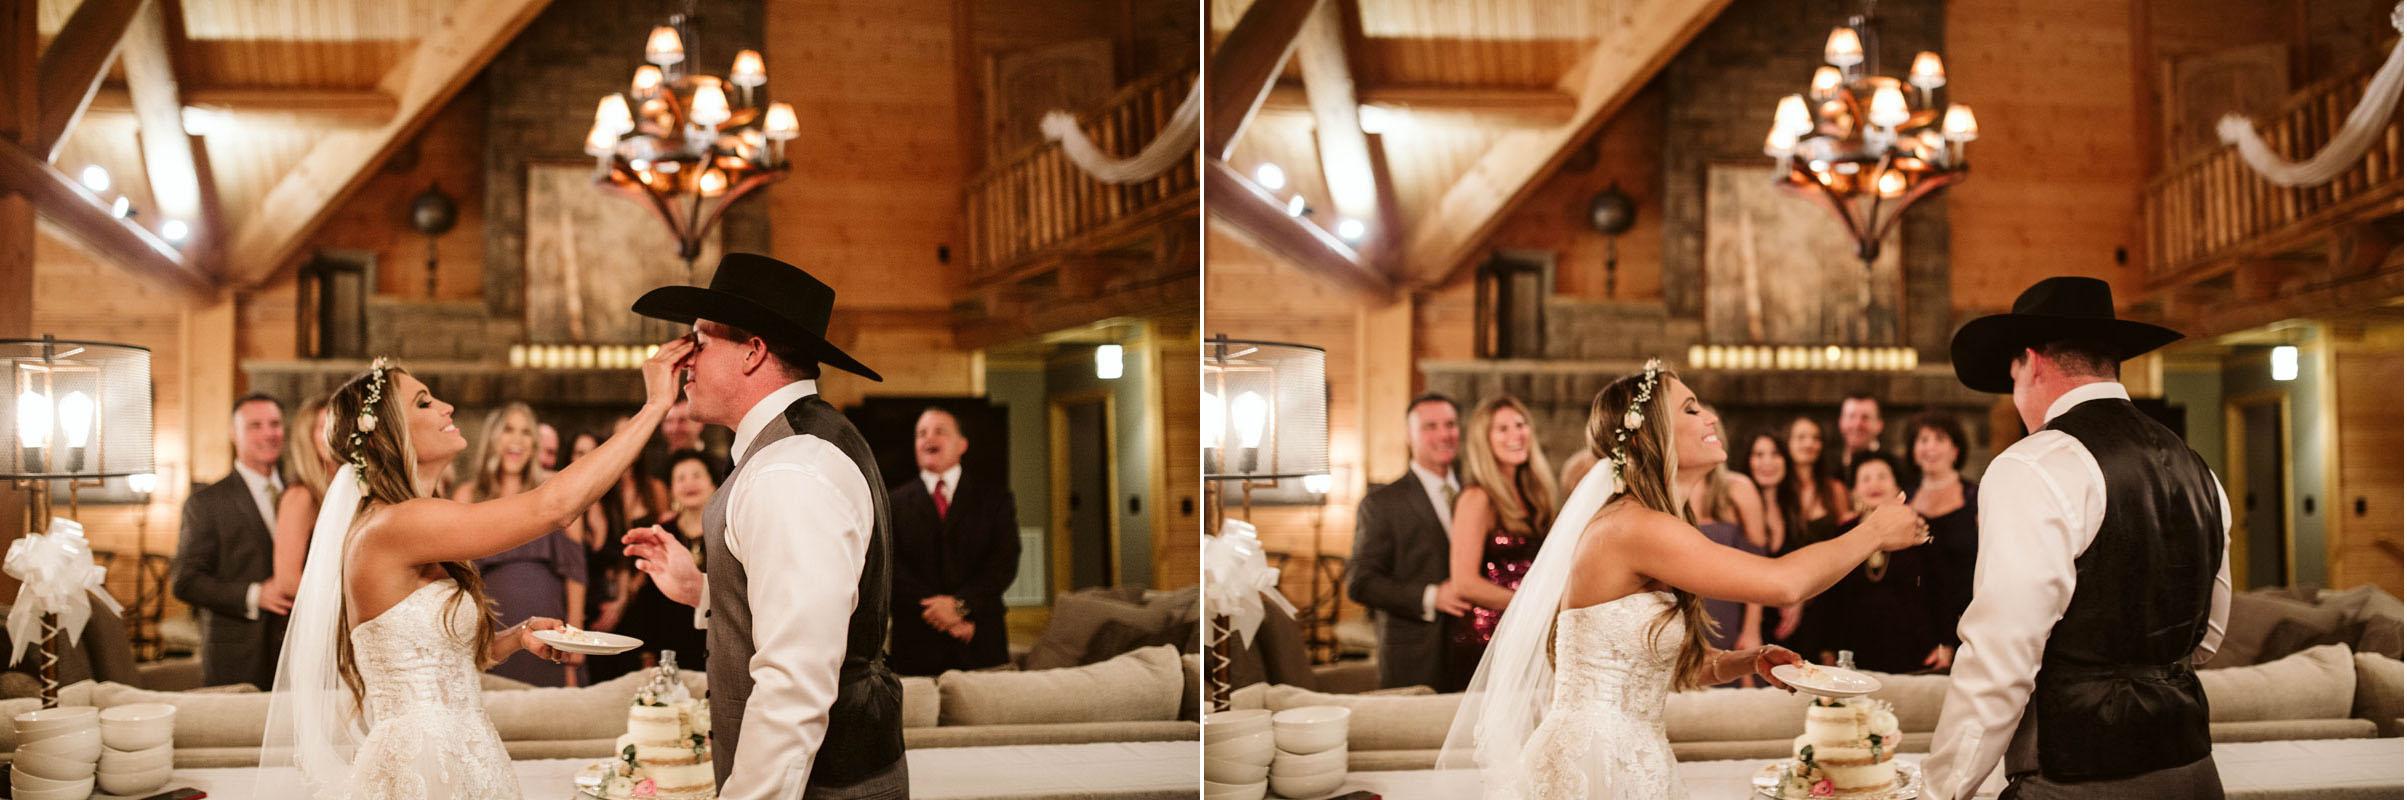 intimate-elopment-blue-ridge-georgia-north-georgia-wedding-photographers (107).jpg